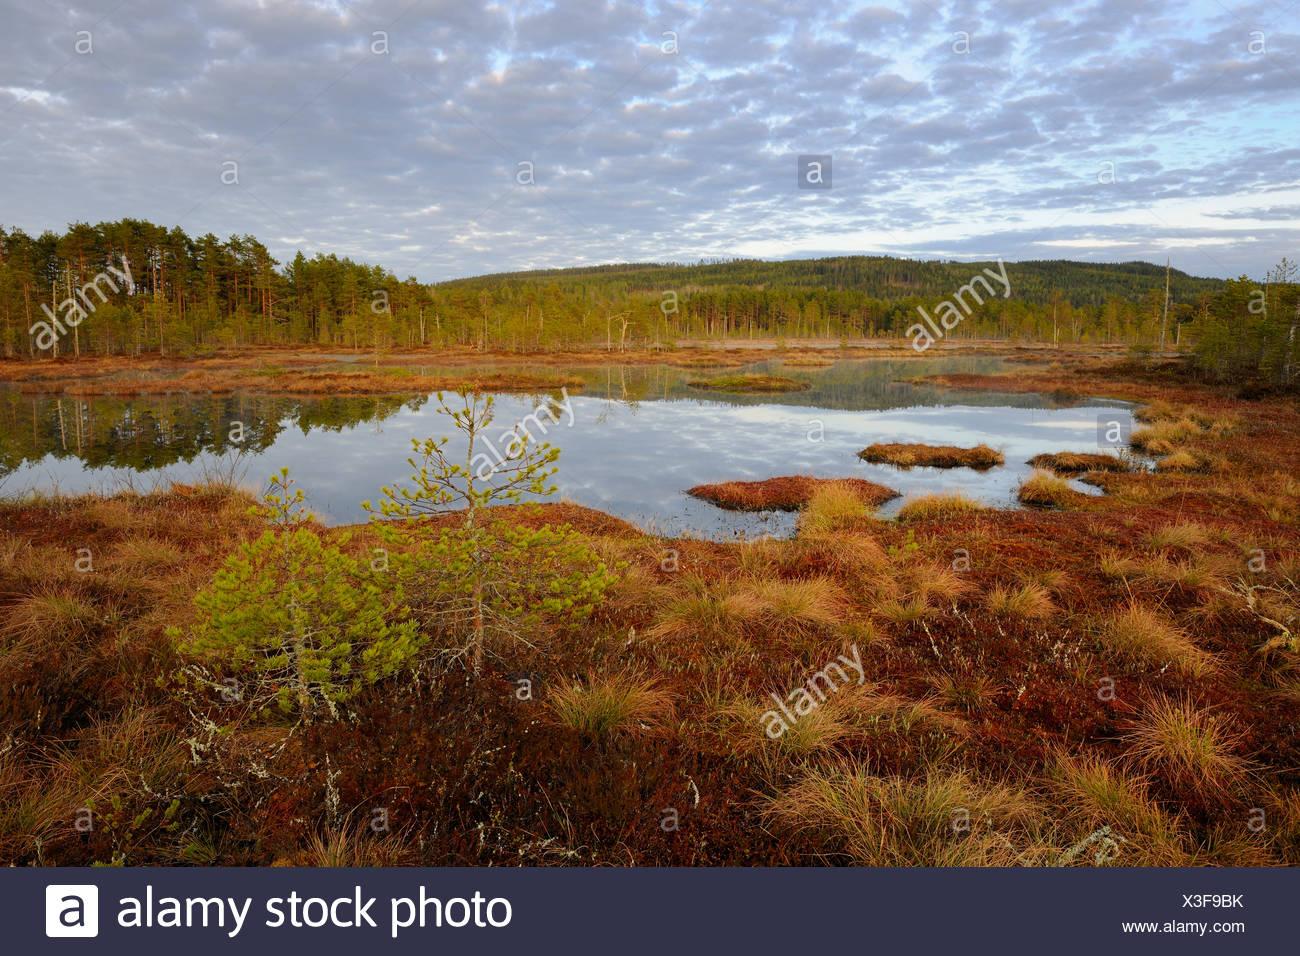 Swamp in the morning, Dalarna, Sweden, Scandinavia, Europe - Stock Image